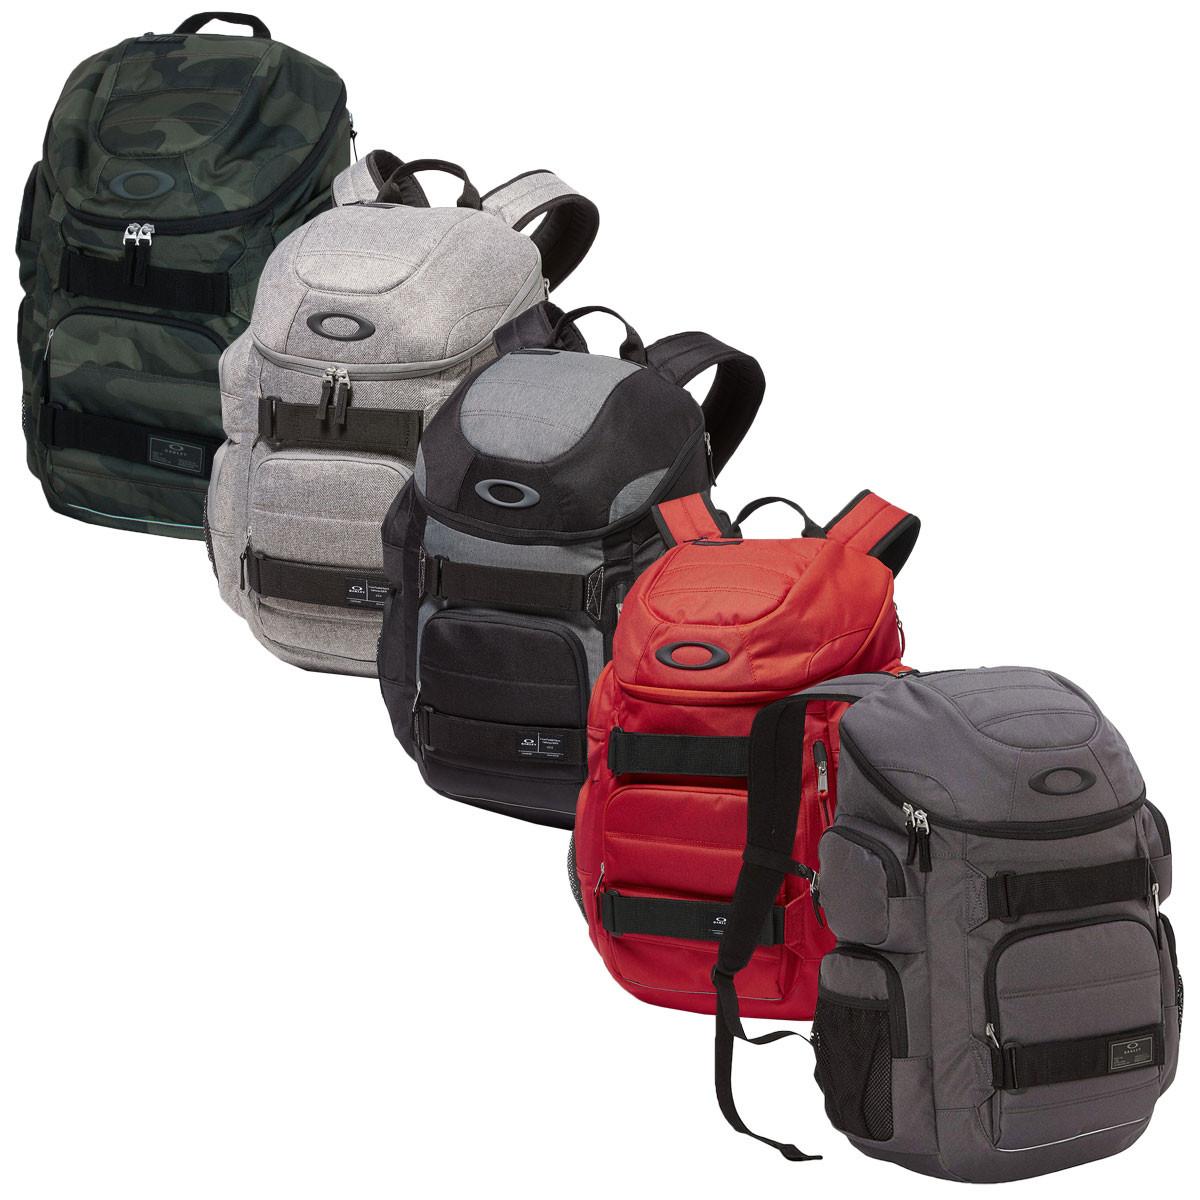 34e5a7c035 Oakley Sport Enduro 30L 2.0 Backpack Rucksack Bag - Bags ...